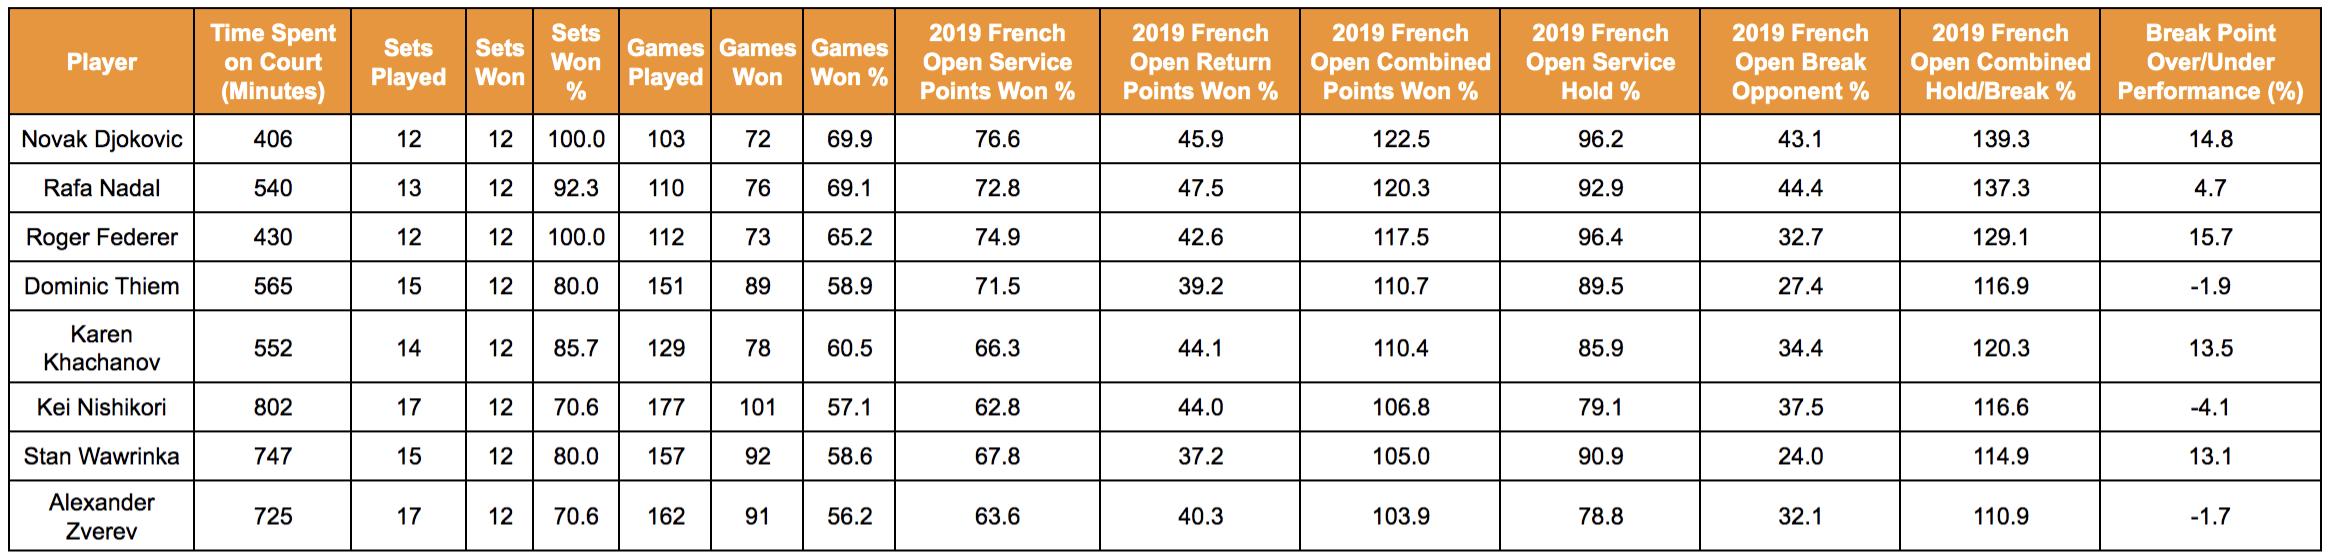 Men's French Open